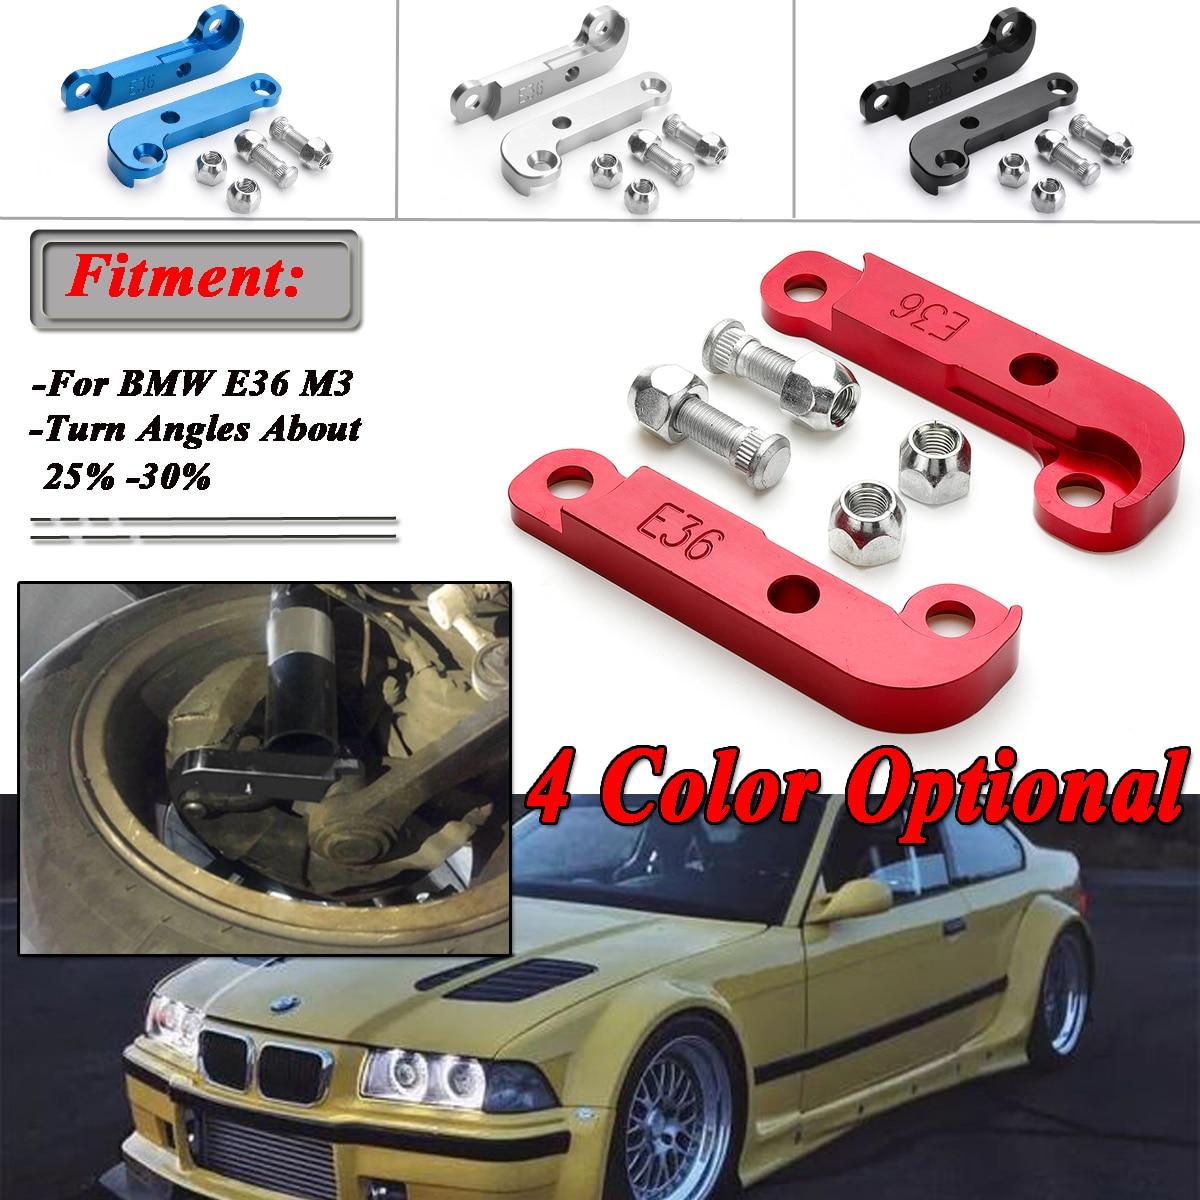 Par de adaptador de 4 colores que aumentan los ángulos de giro alrededor de 25%-30% Drift Lock Kit para BMW E36 M3 Tuning Drift Power adaptadores y montaje